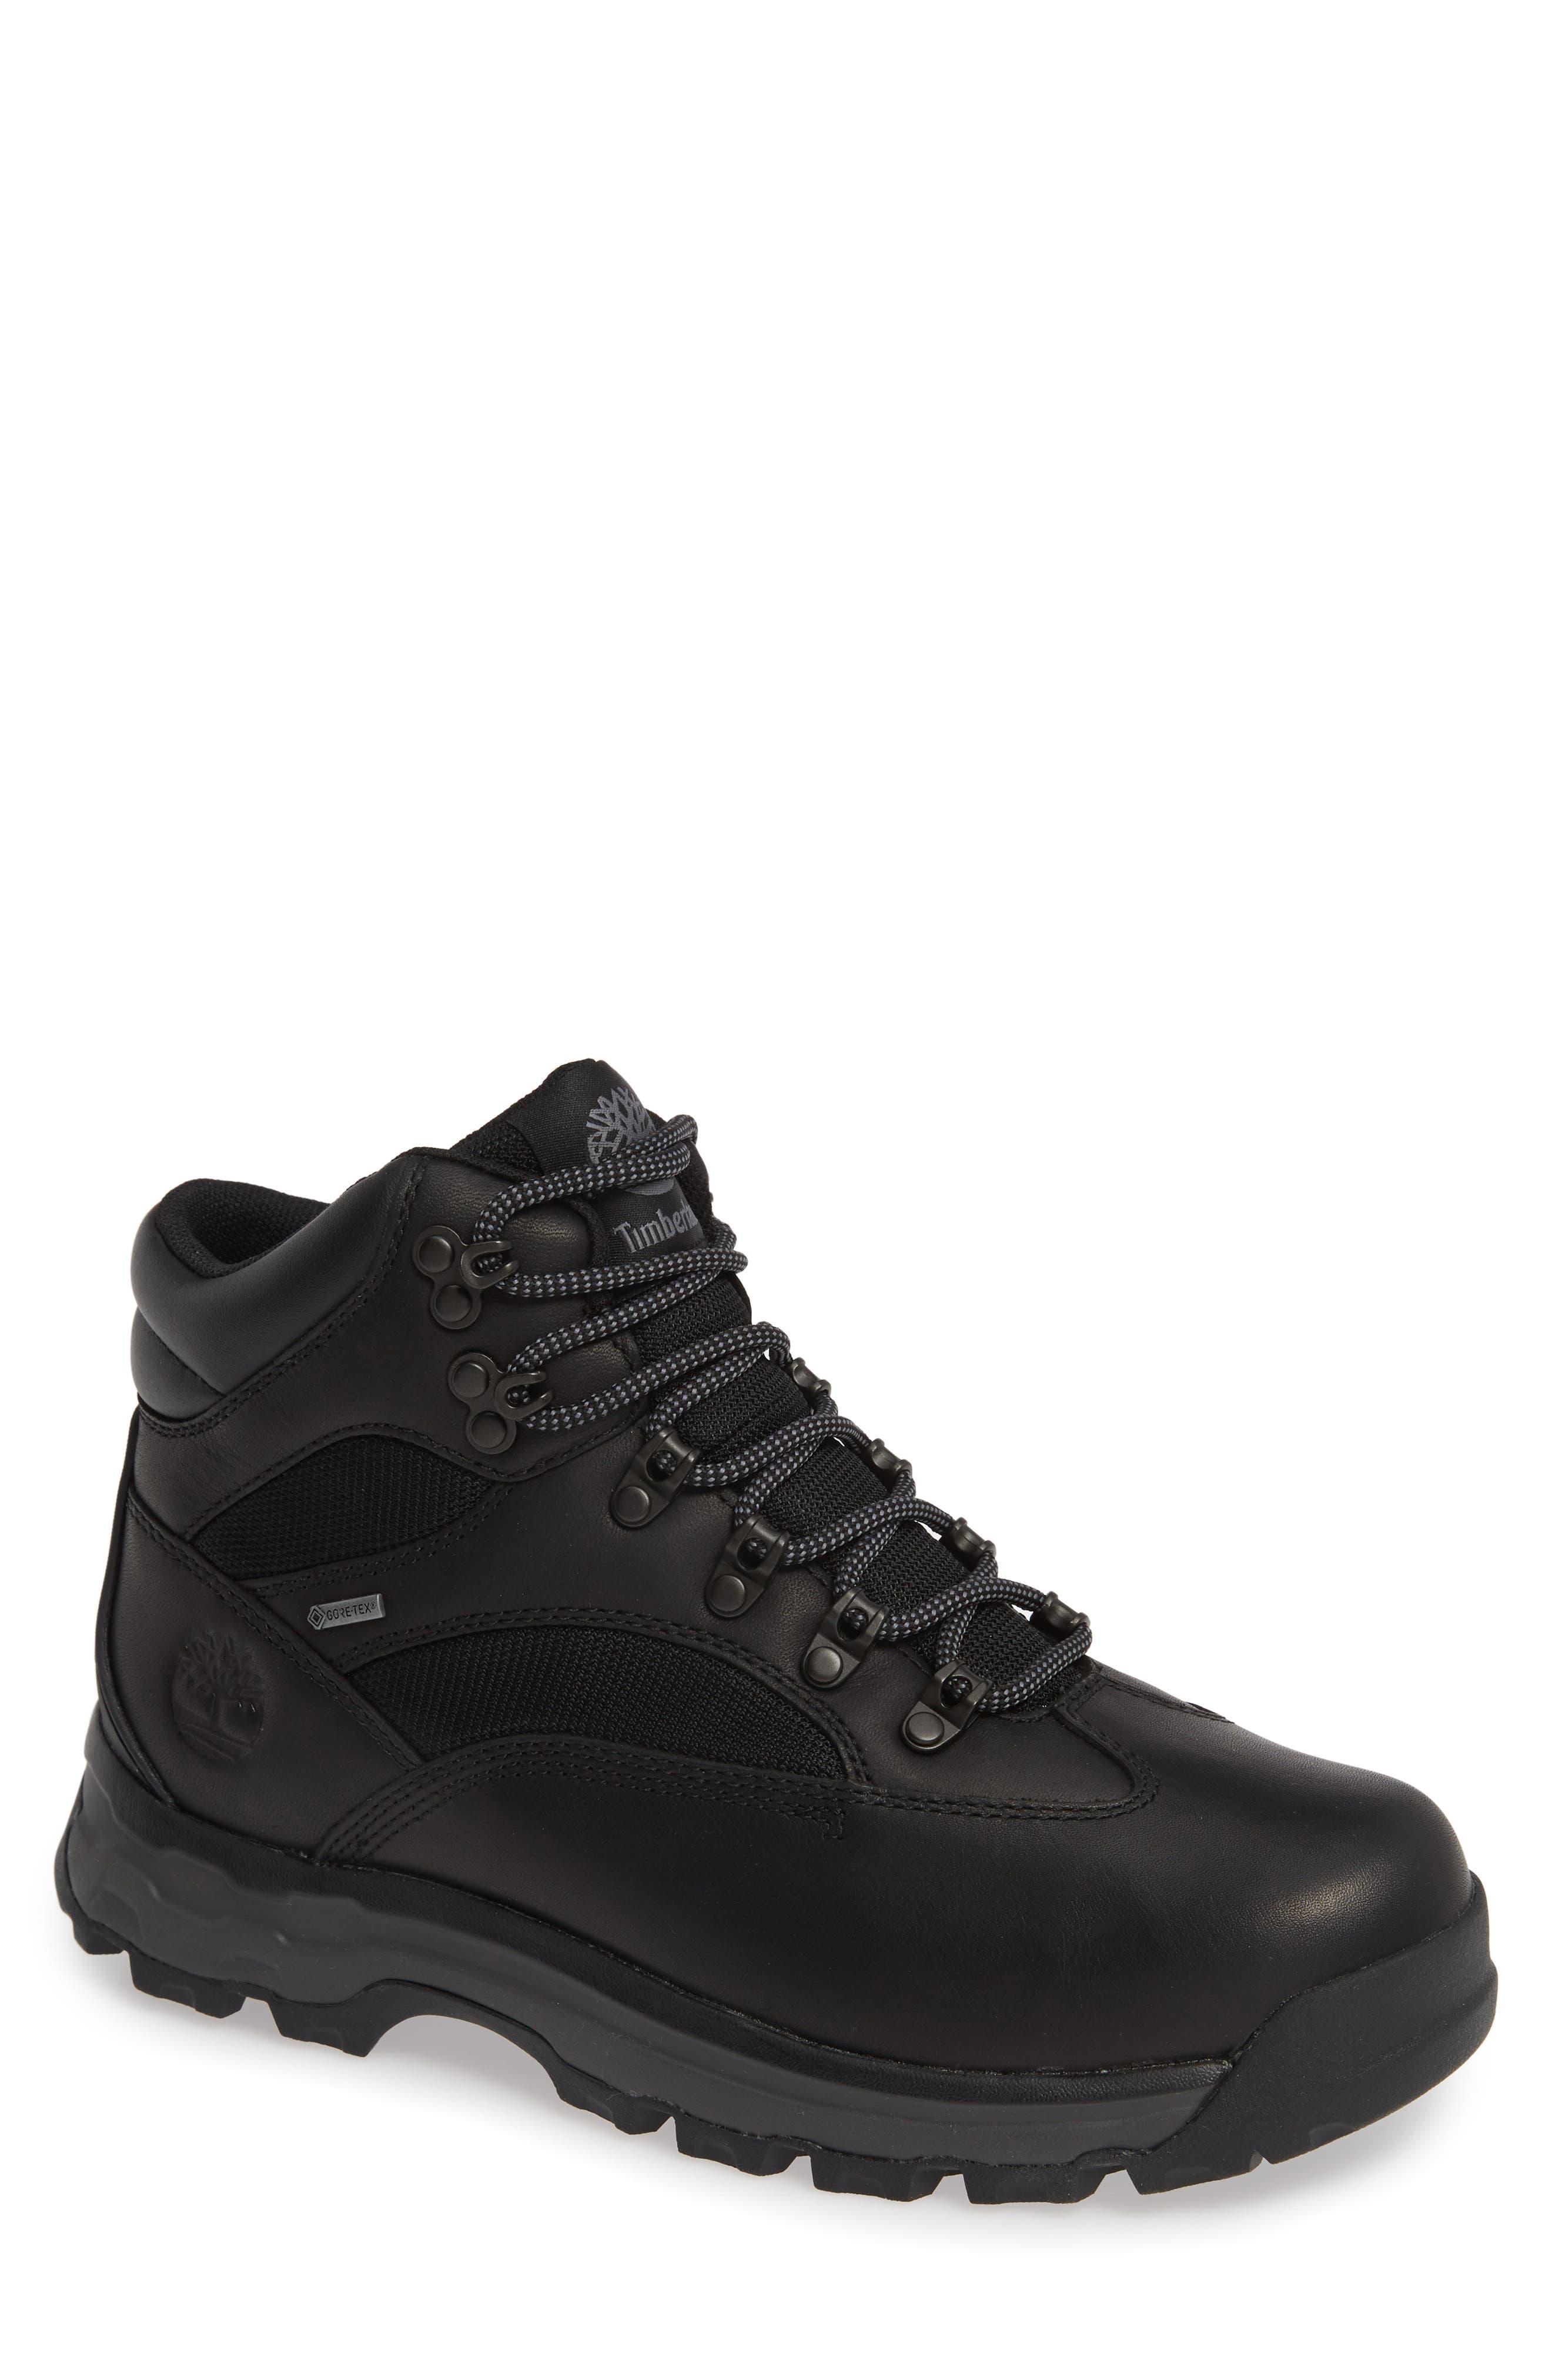 Timberland Chocorua Trail Gore-Tex Waterproof Hiking Boot- Black